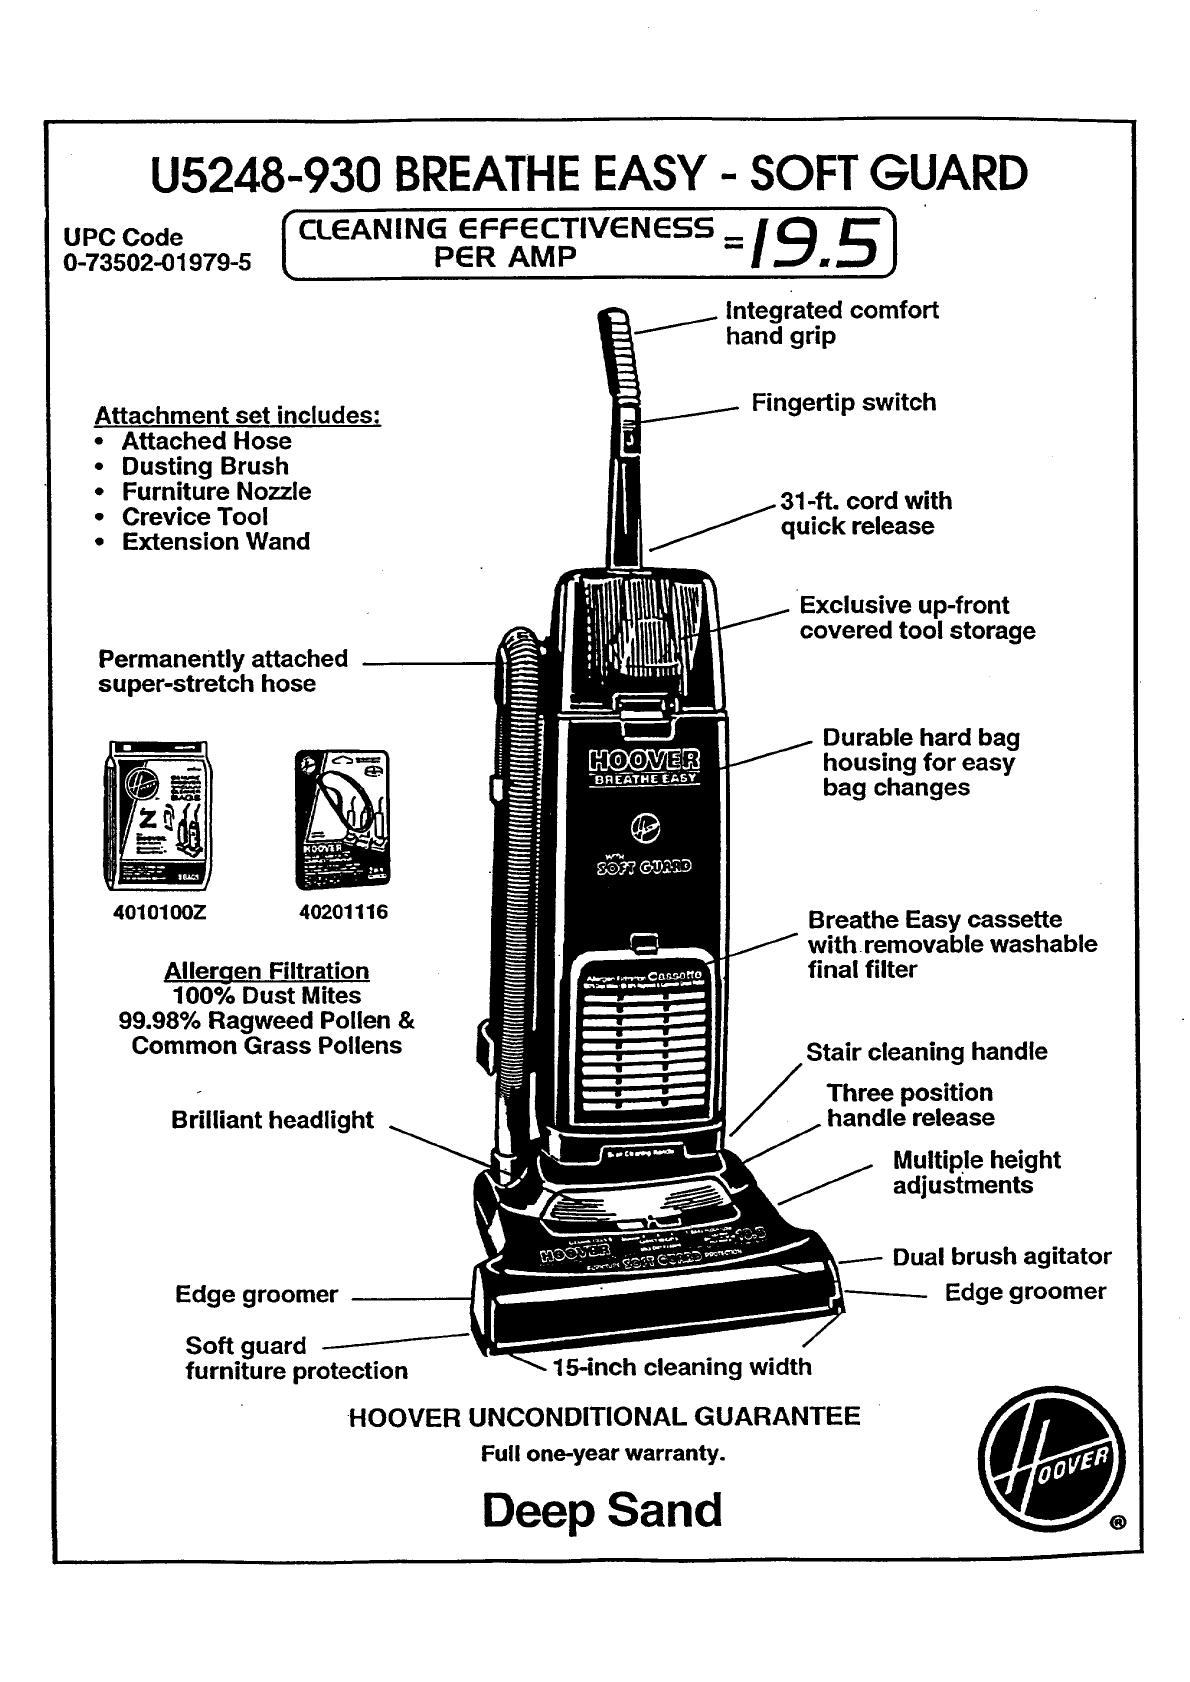 Hoover Deep Sand U5248 930 Users Manual